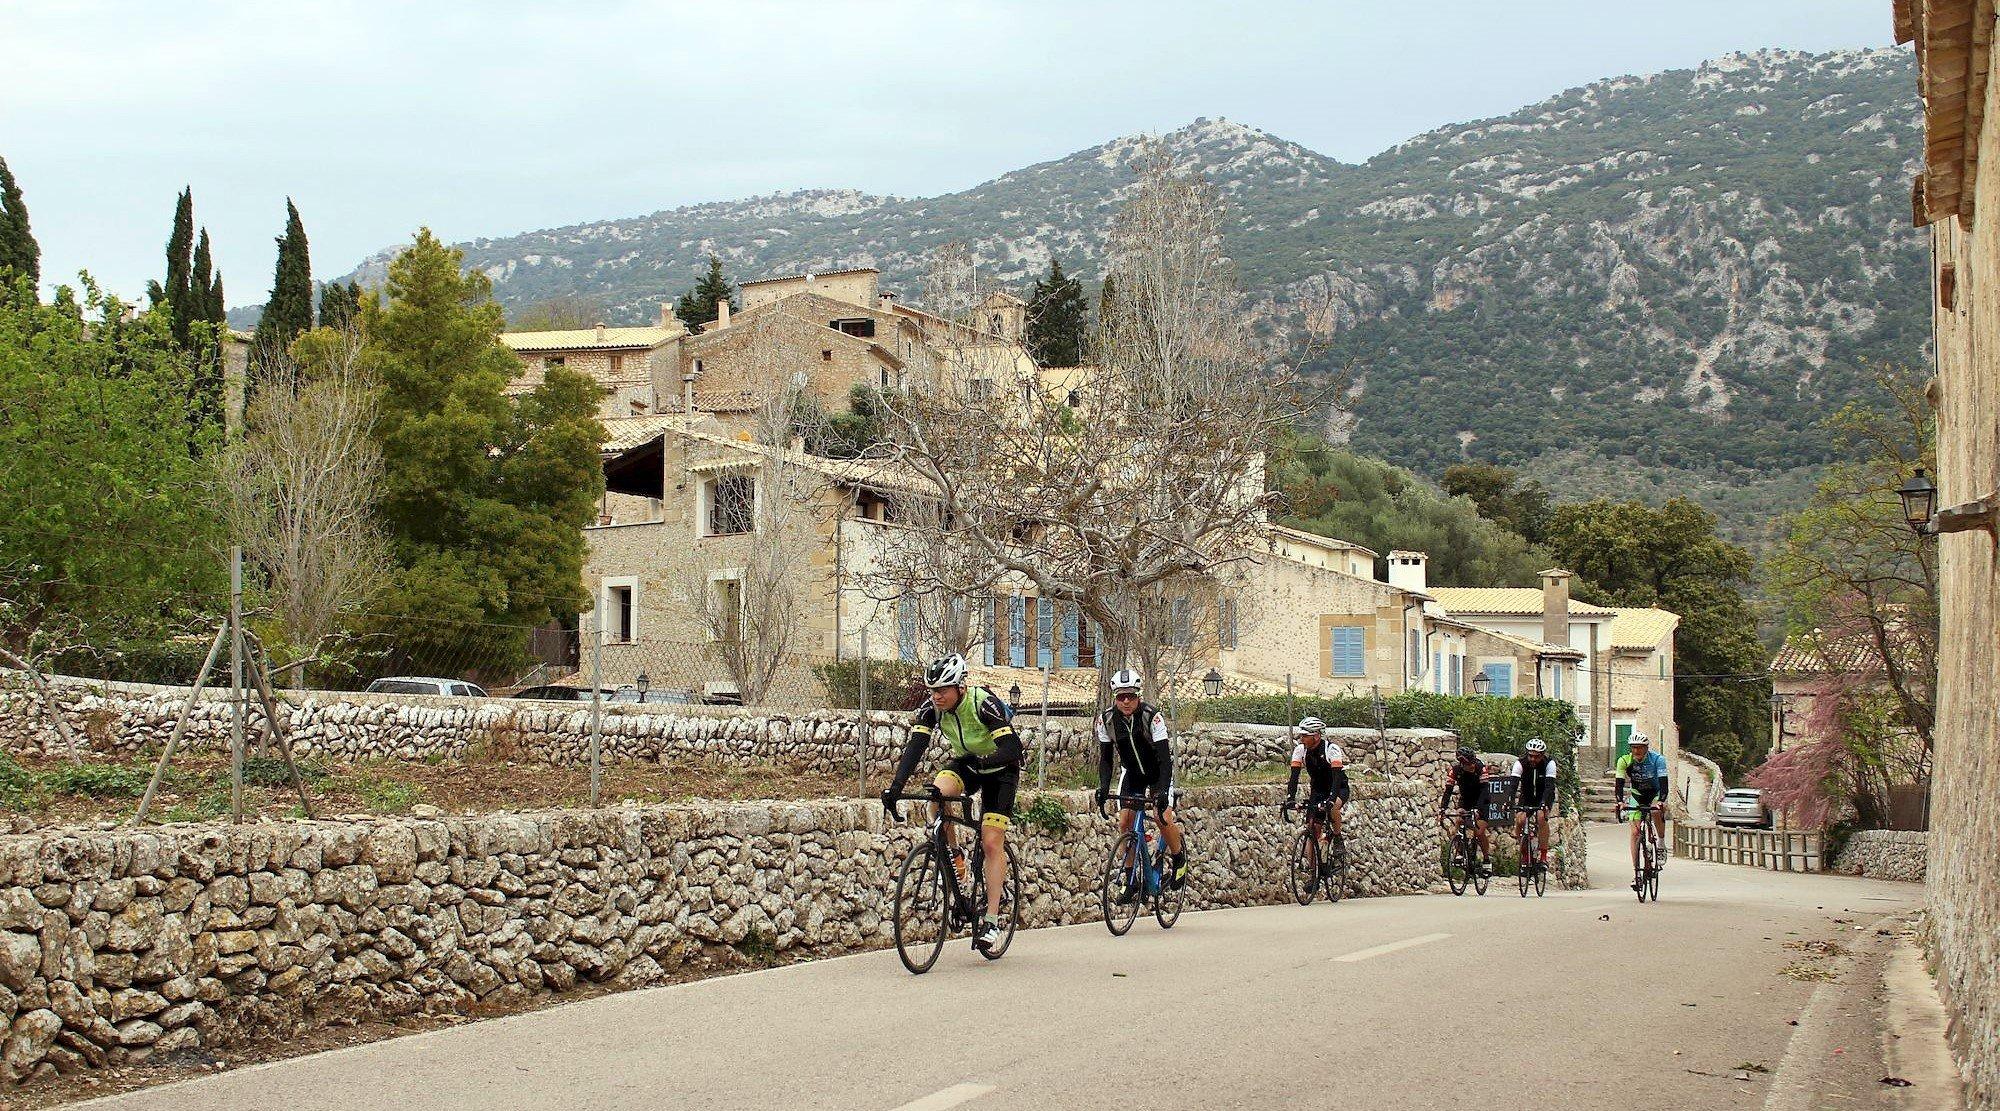 Serra de Tramuntana en bicicleta. Orient. BICIS EN RUTA. 1170x650